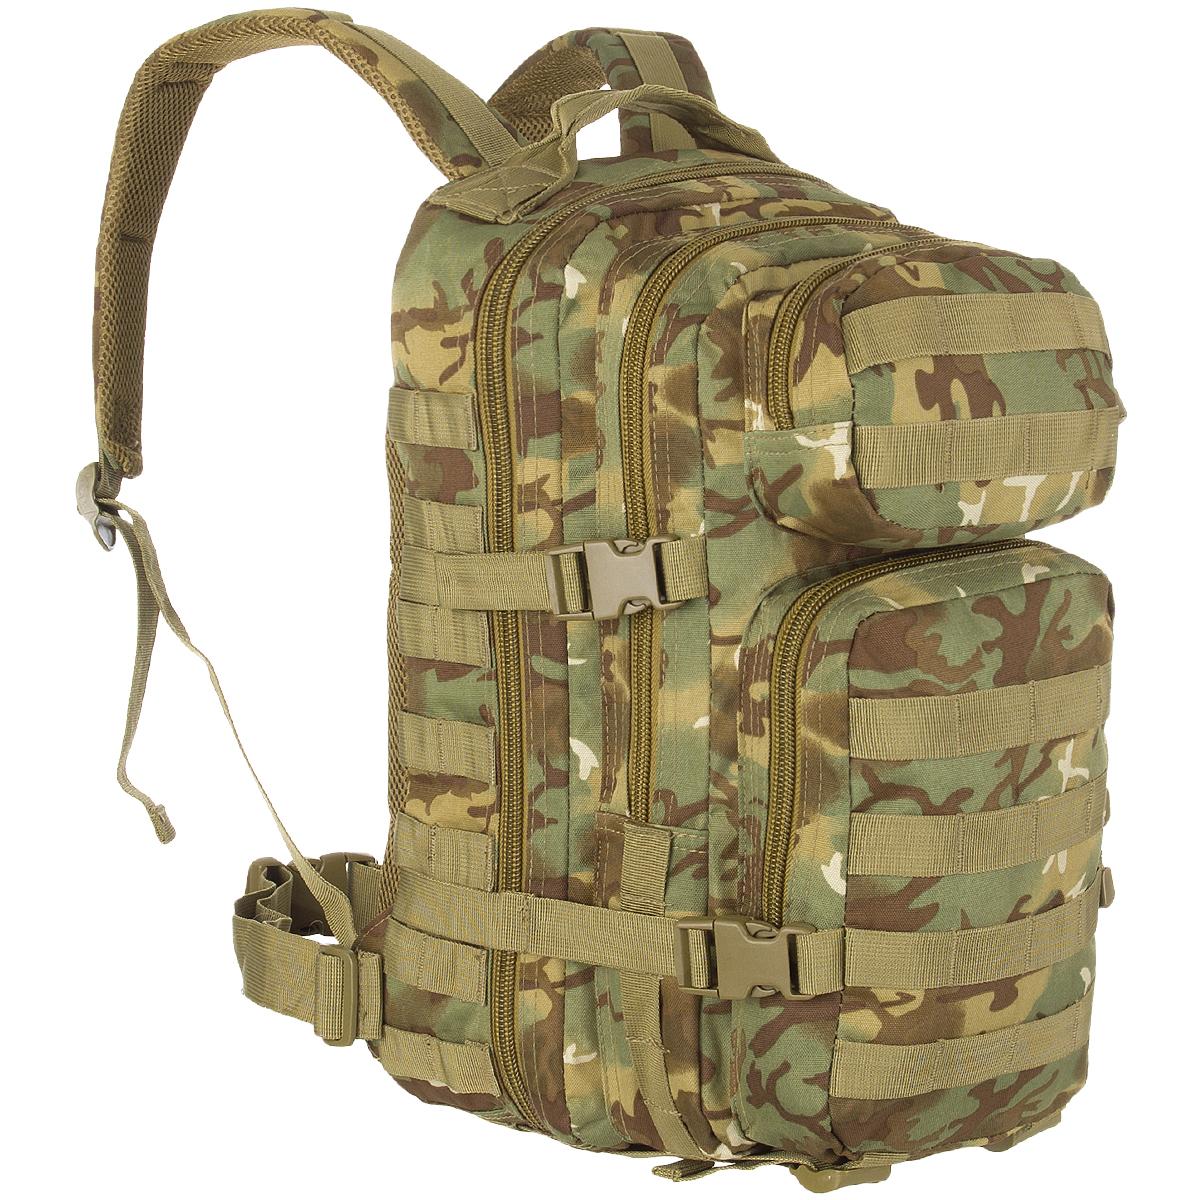 d7e815120f737 Plecak Mil-Tec US Assault Mały Arid Woodland Plecak Mil-Tec US Assault Mały  Arid Woodland